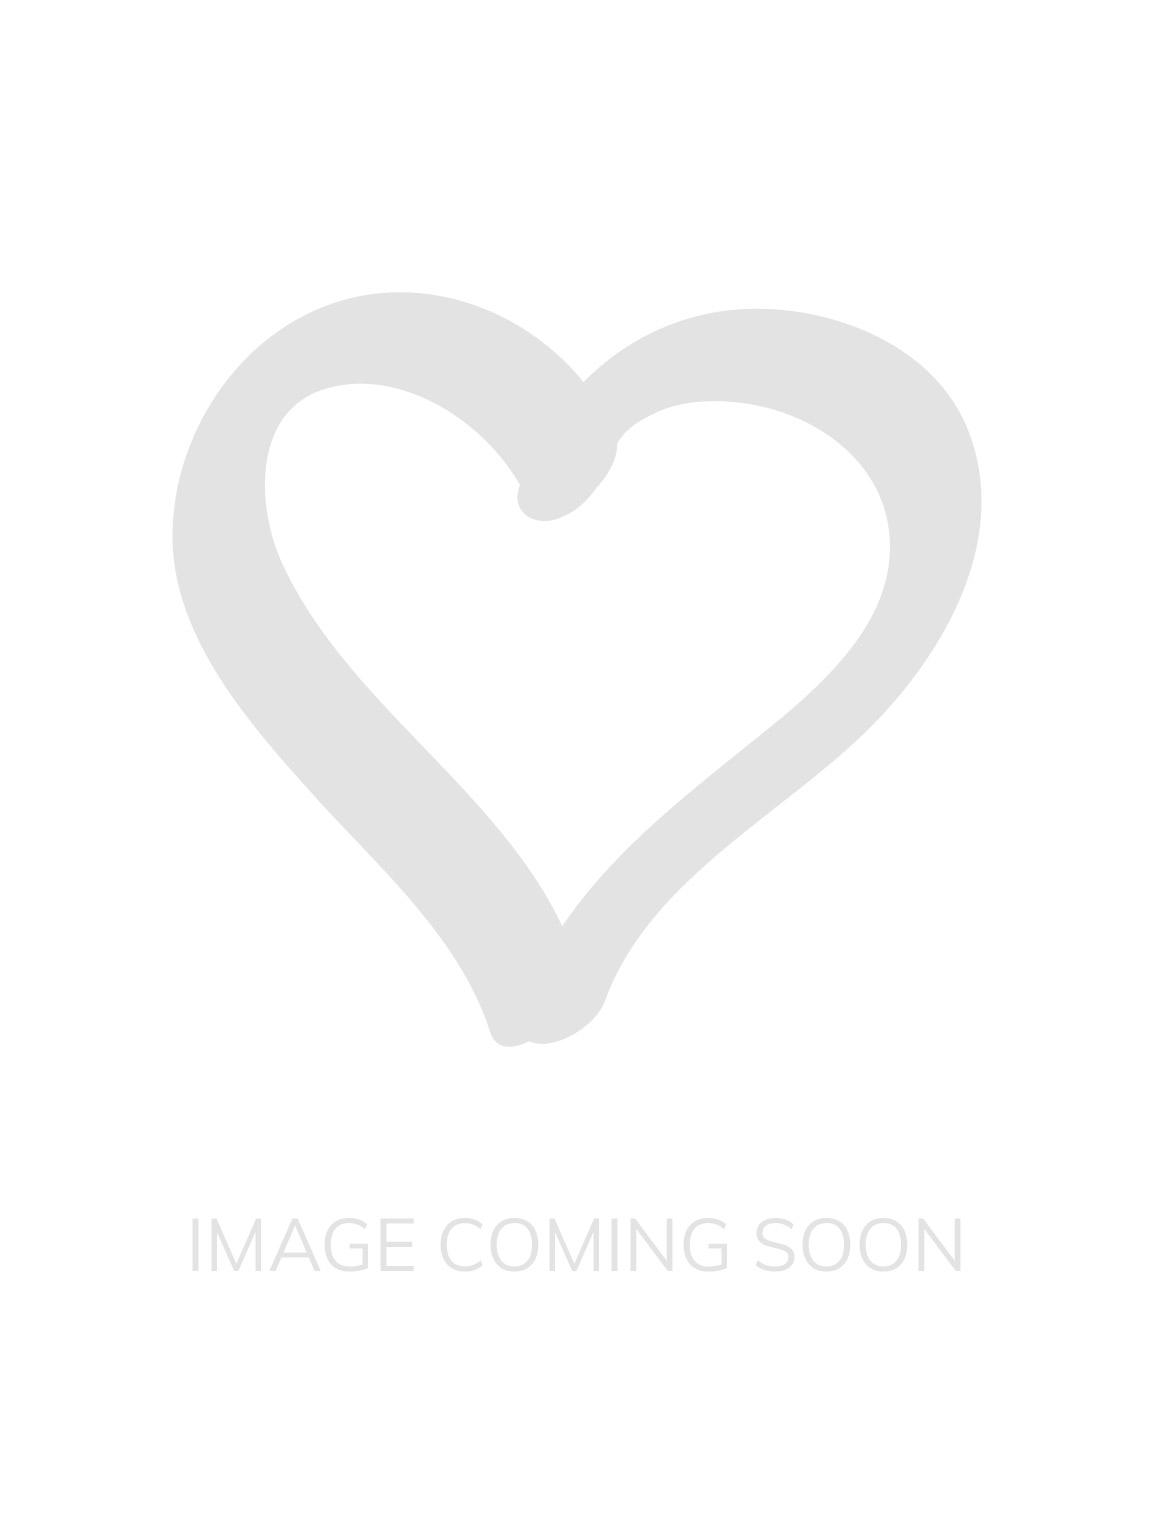 f09a50cd3ad Embrace Lace T Shirt Bra - Lemon Ivory